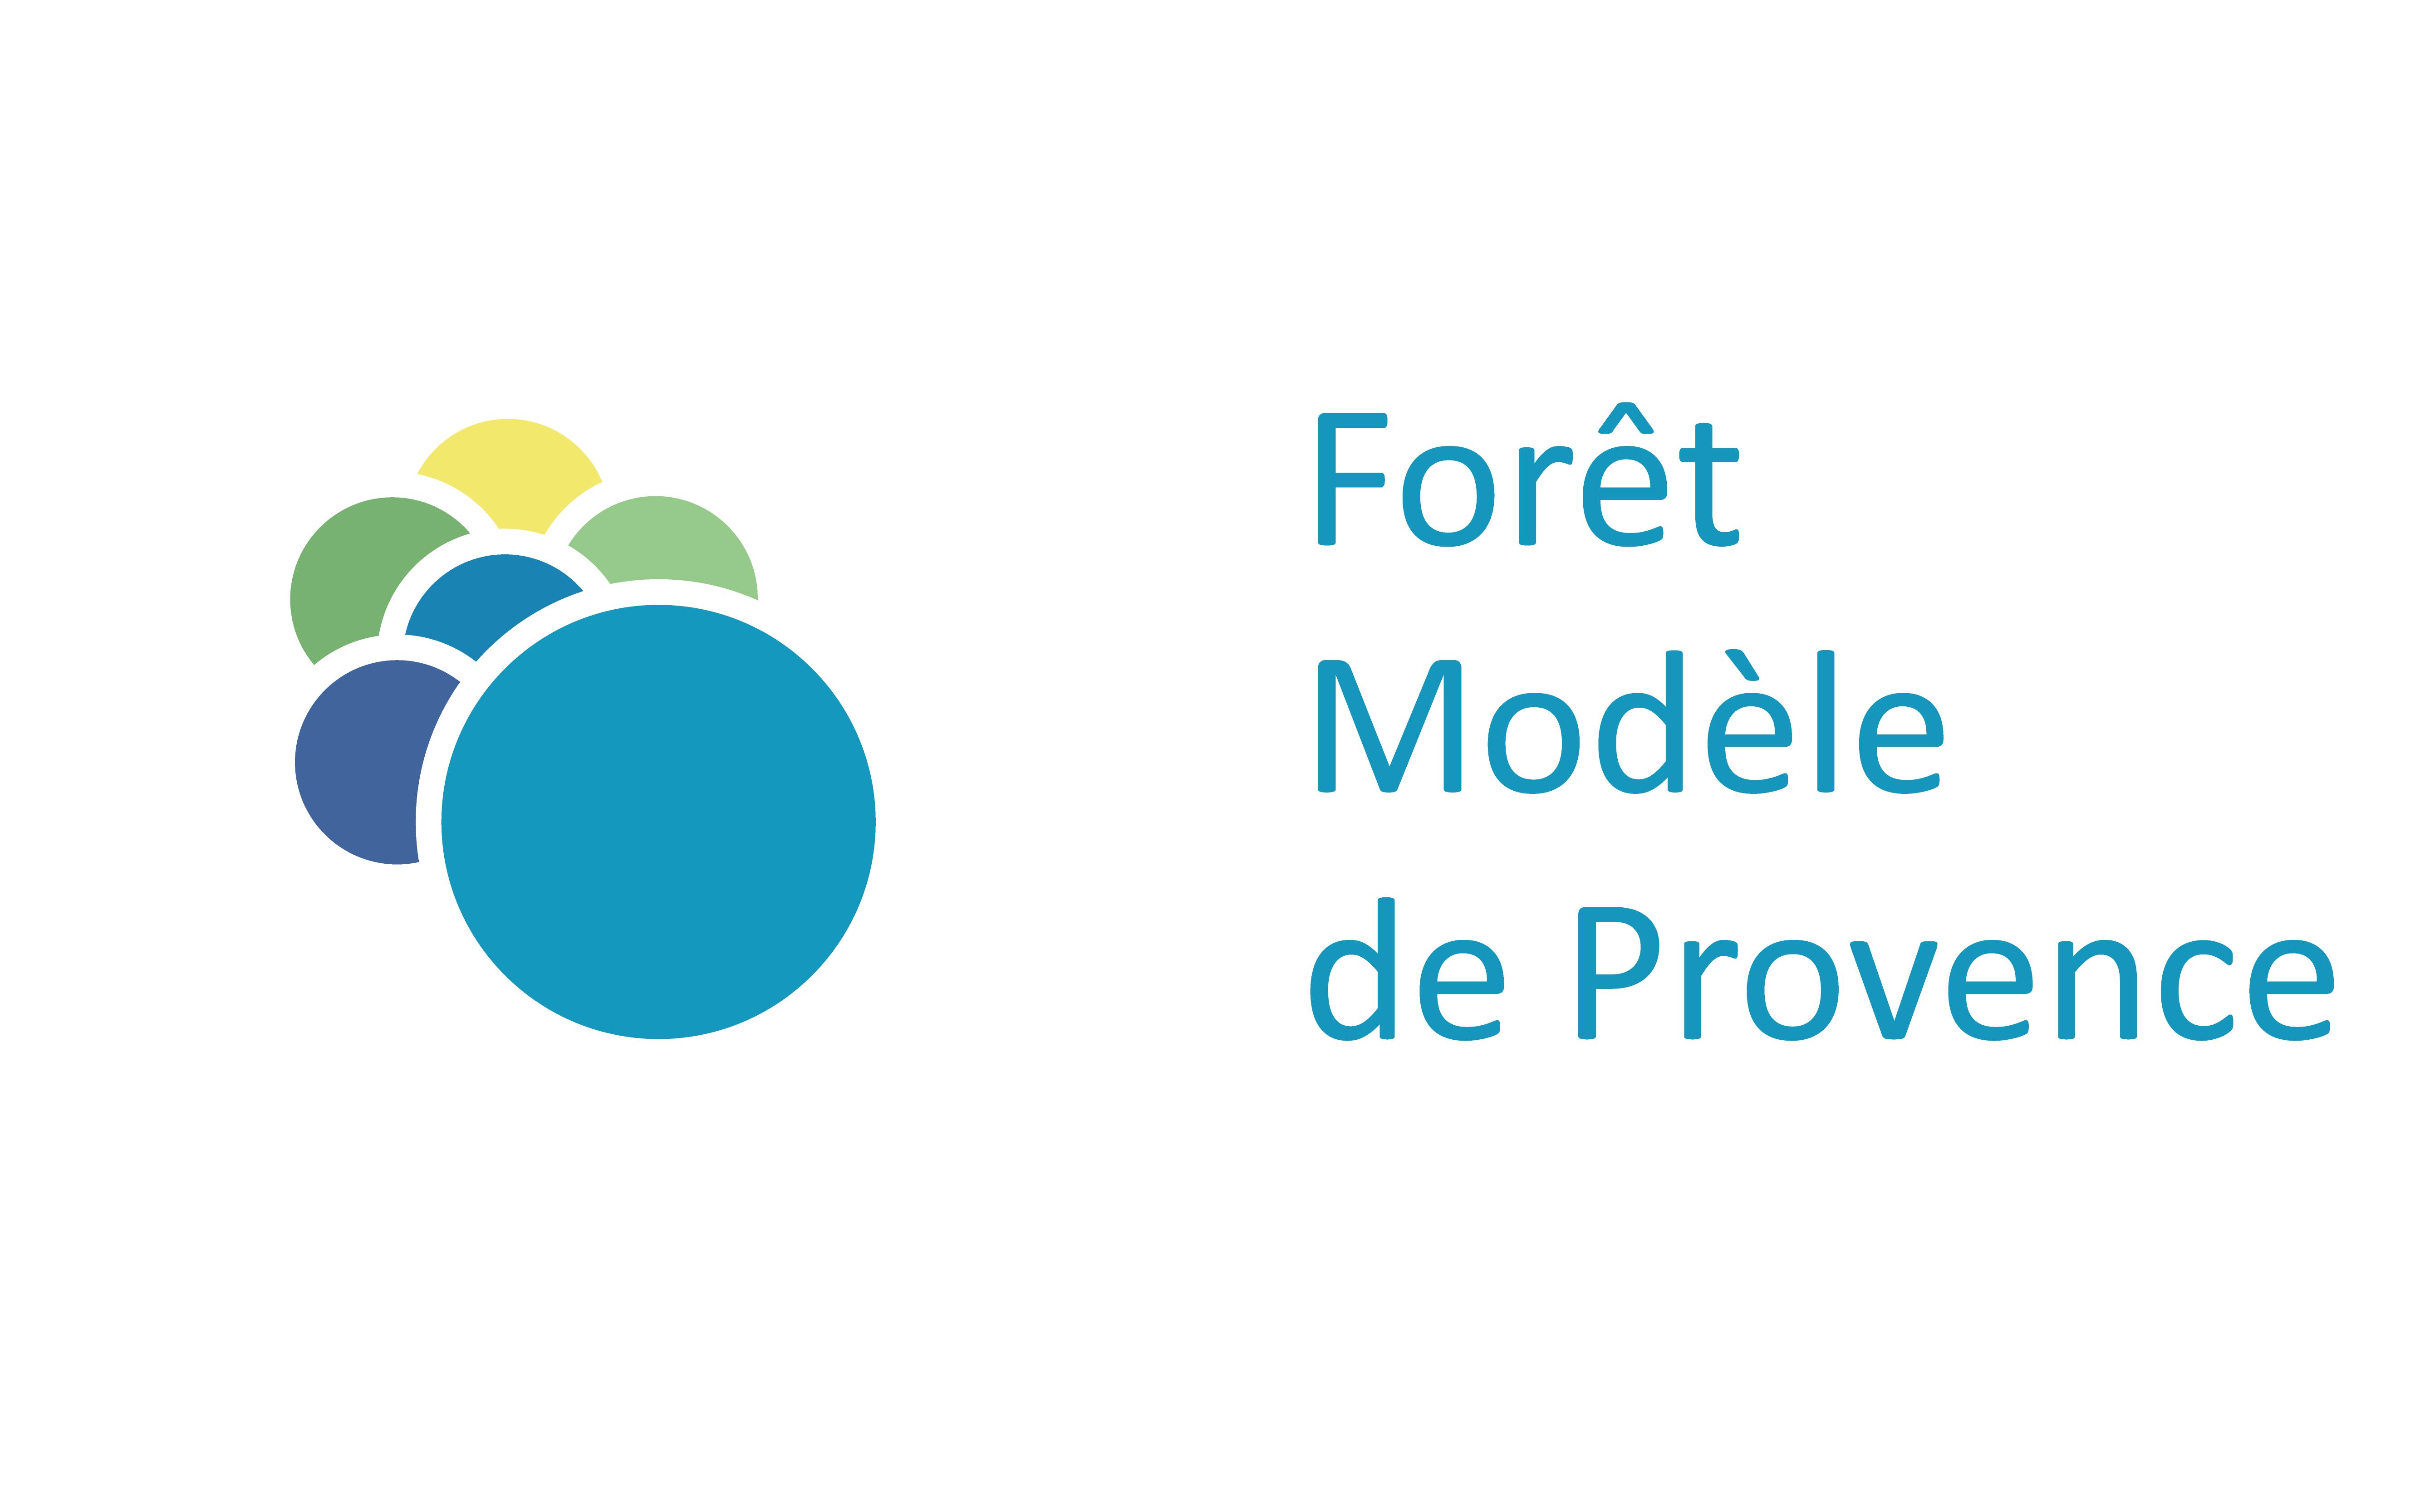 Logo_Forêt_Modèle_de_Provence_1280x800_fond_blanc